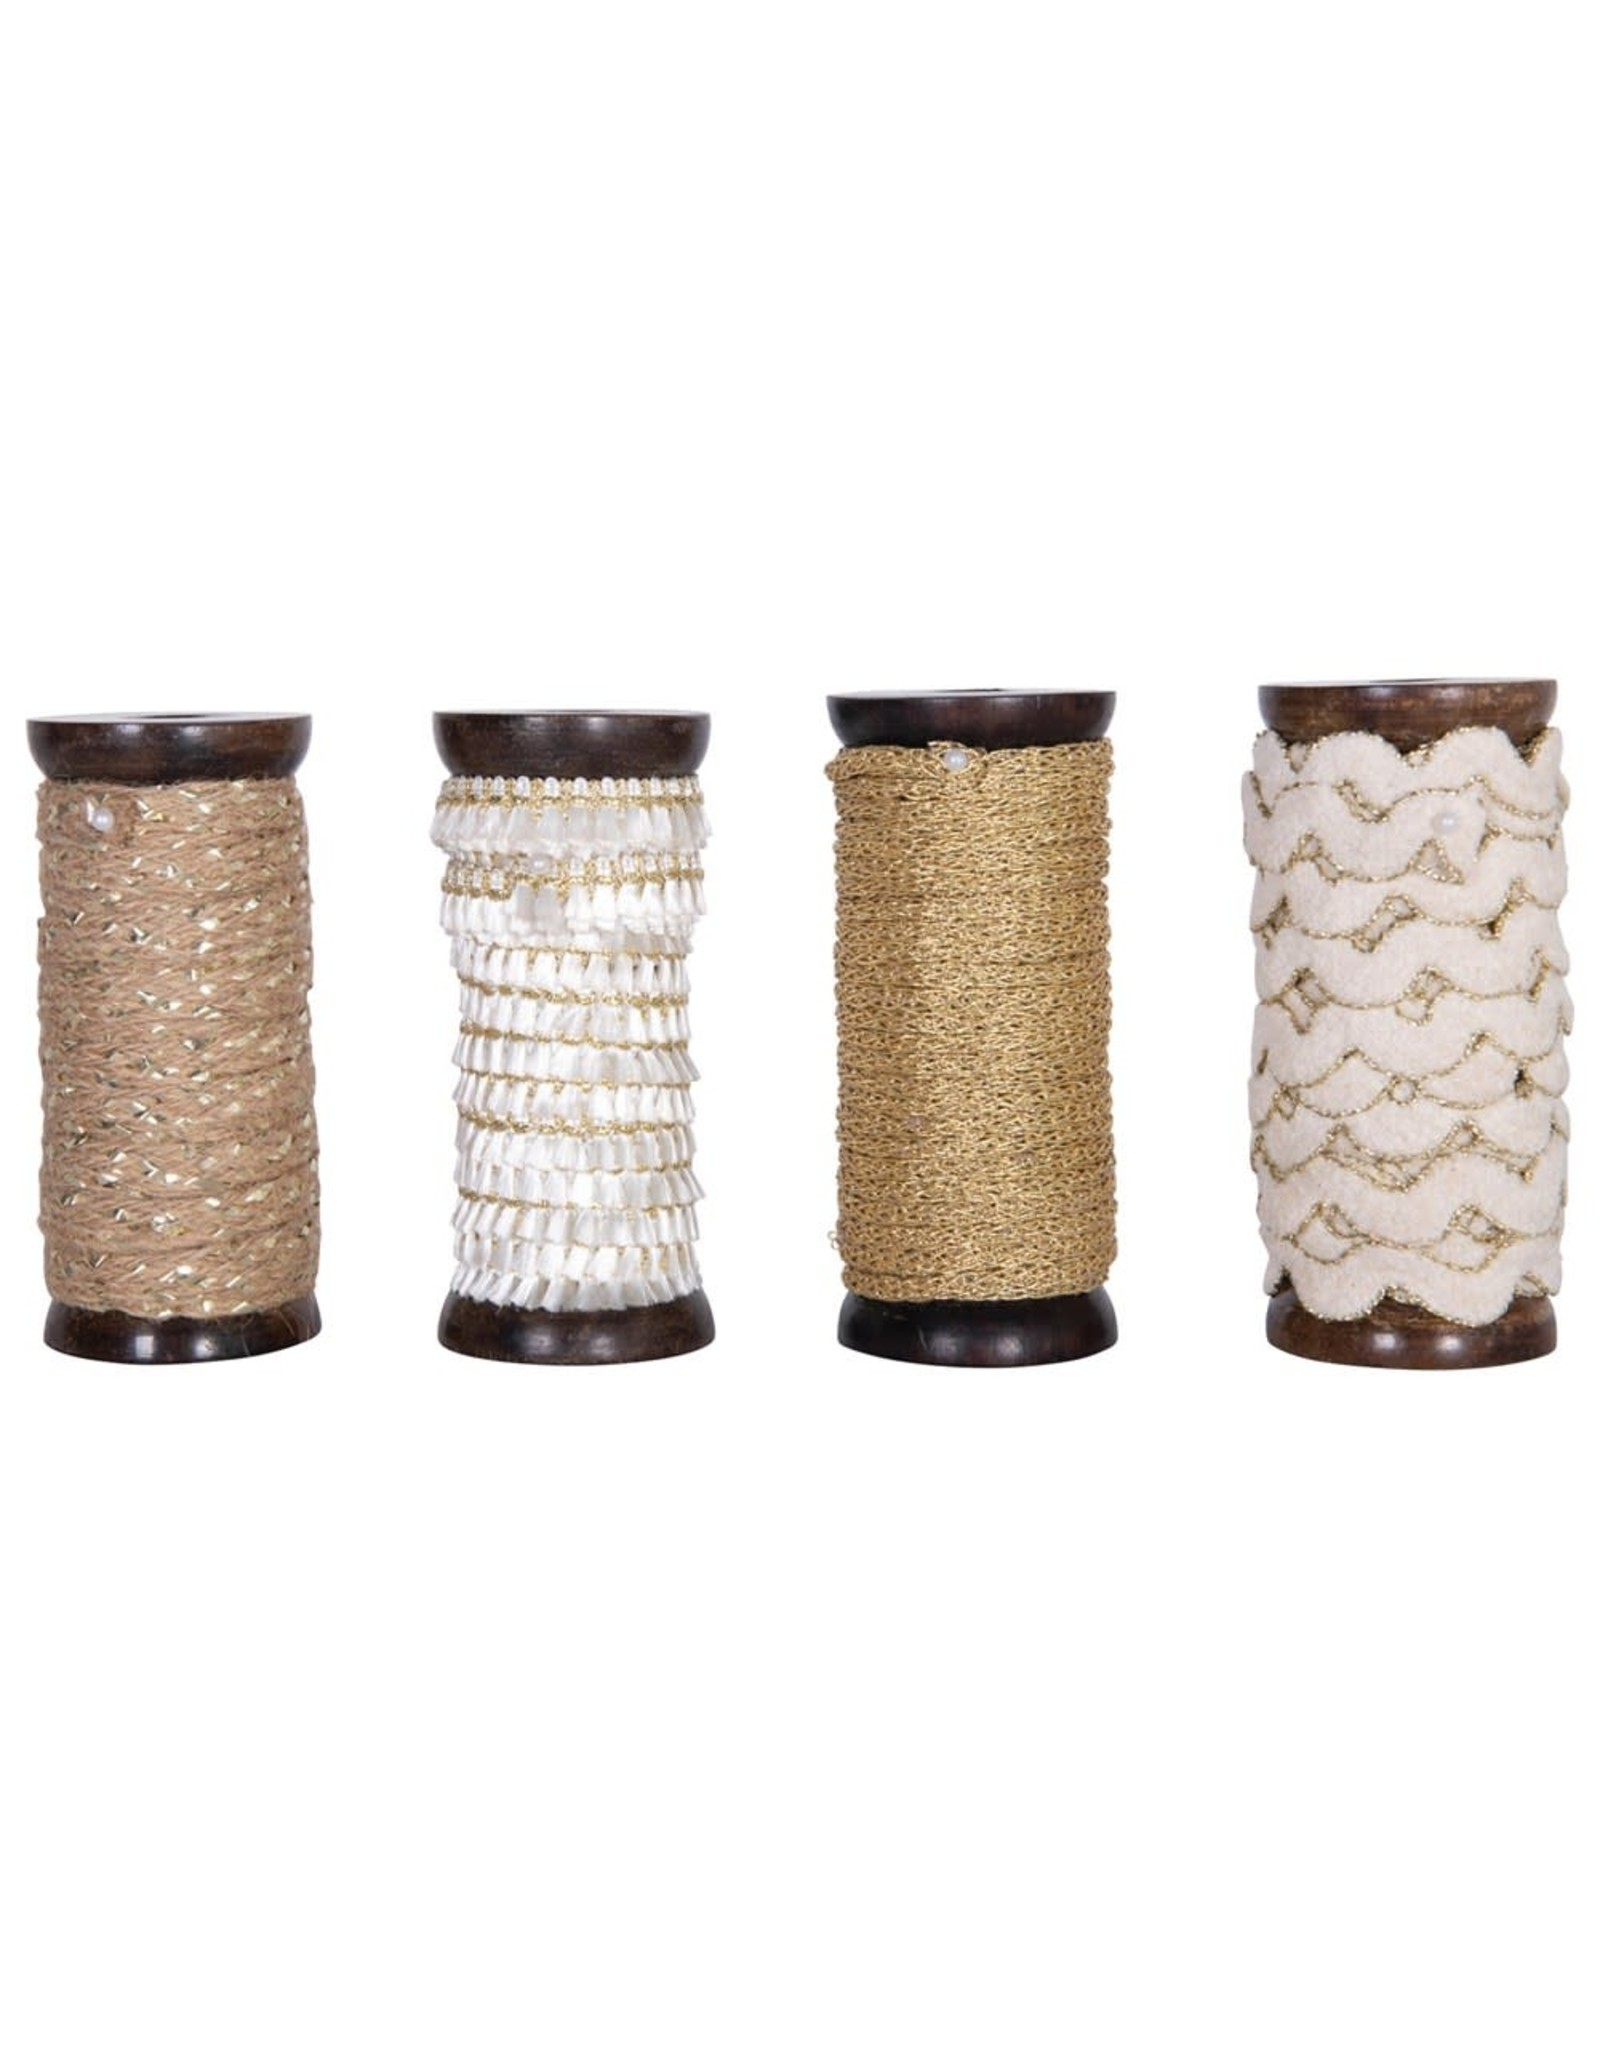 Creative Co-op Metallic Ribbon Spools - 10 yd - Cream Ric Rac